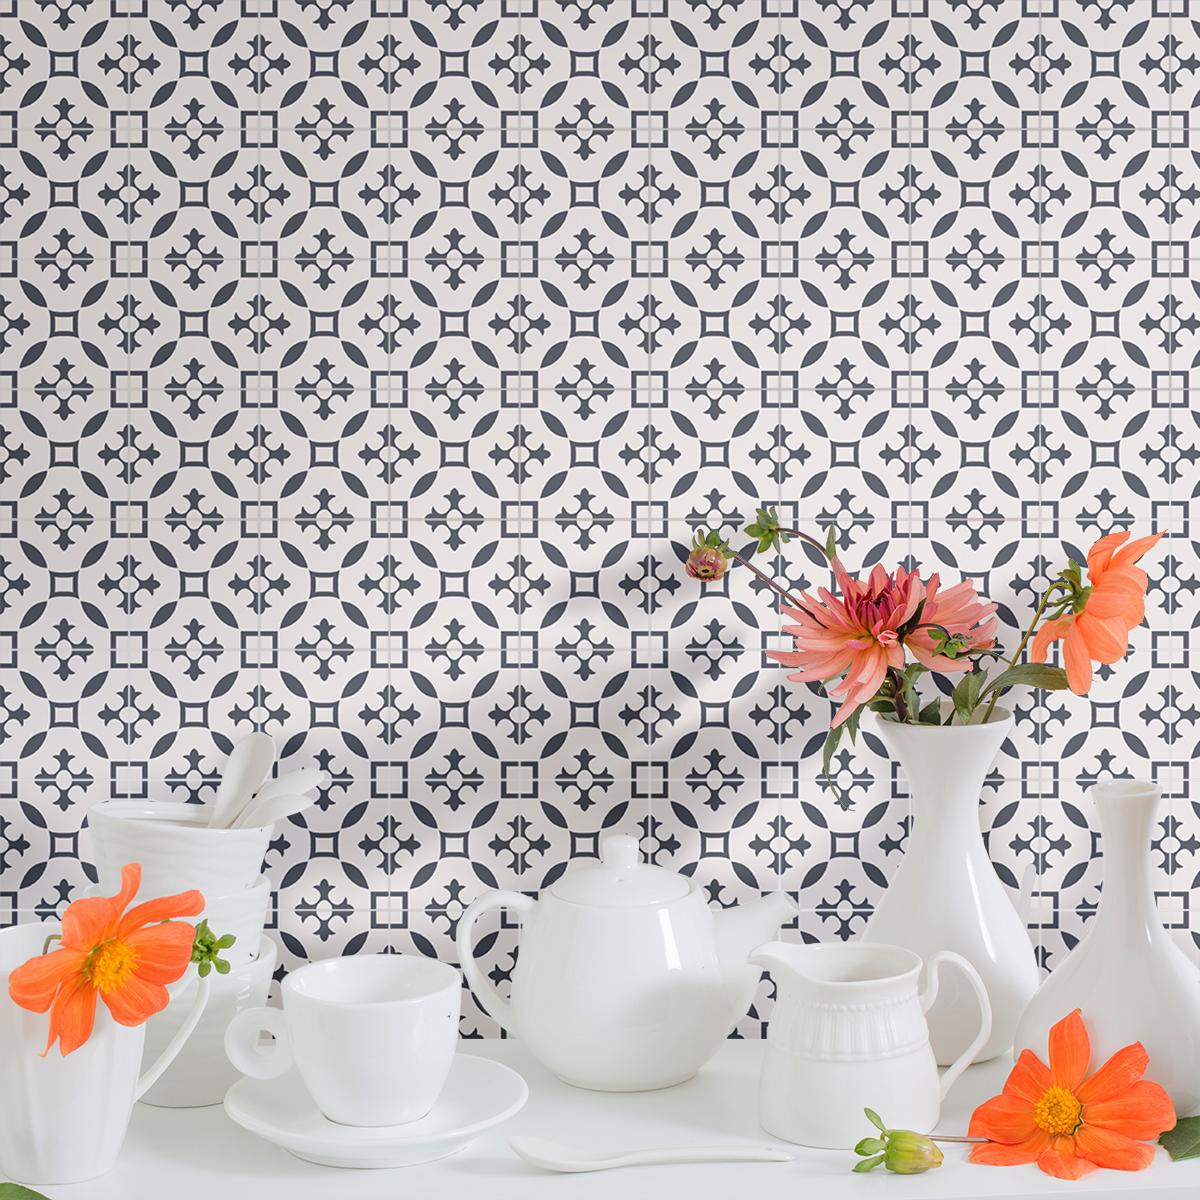 9 stickers carreaux de ciment azulejos venico cuisine. Black Bedroom Furniture Sets. Home Design Ideas